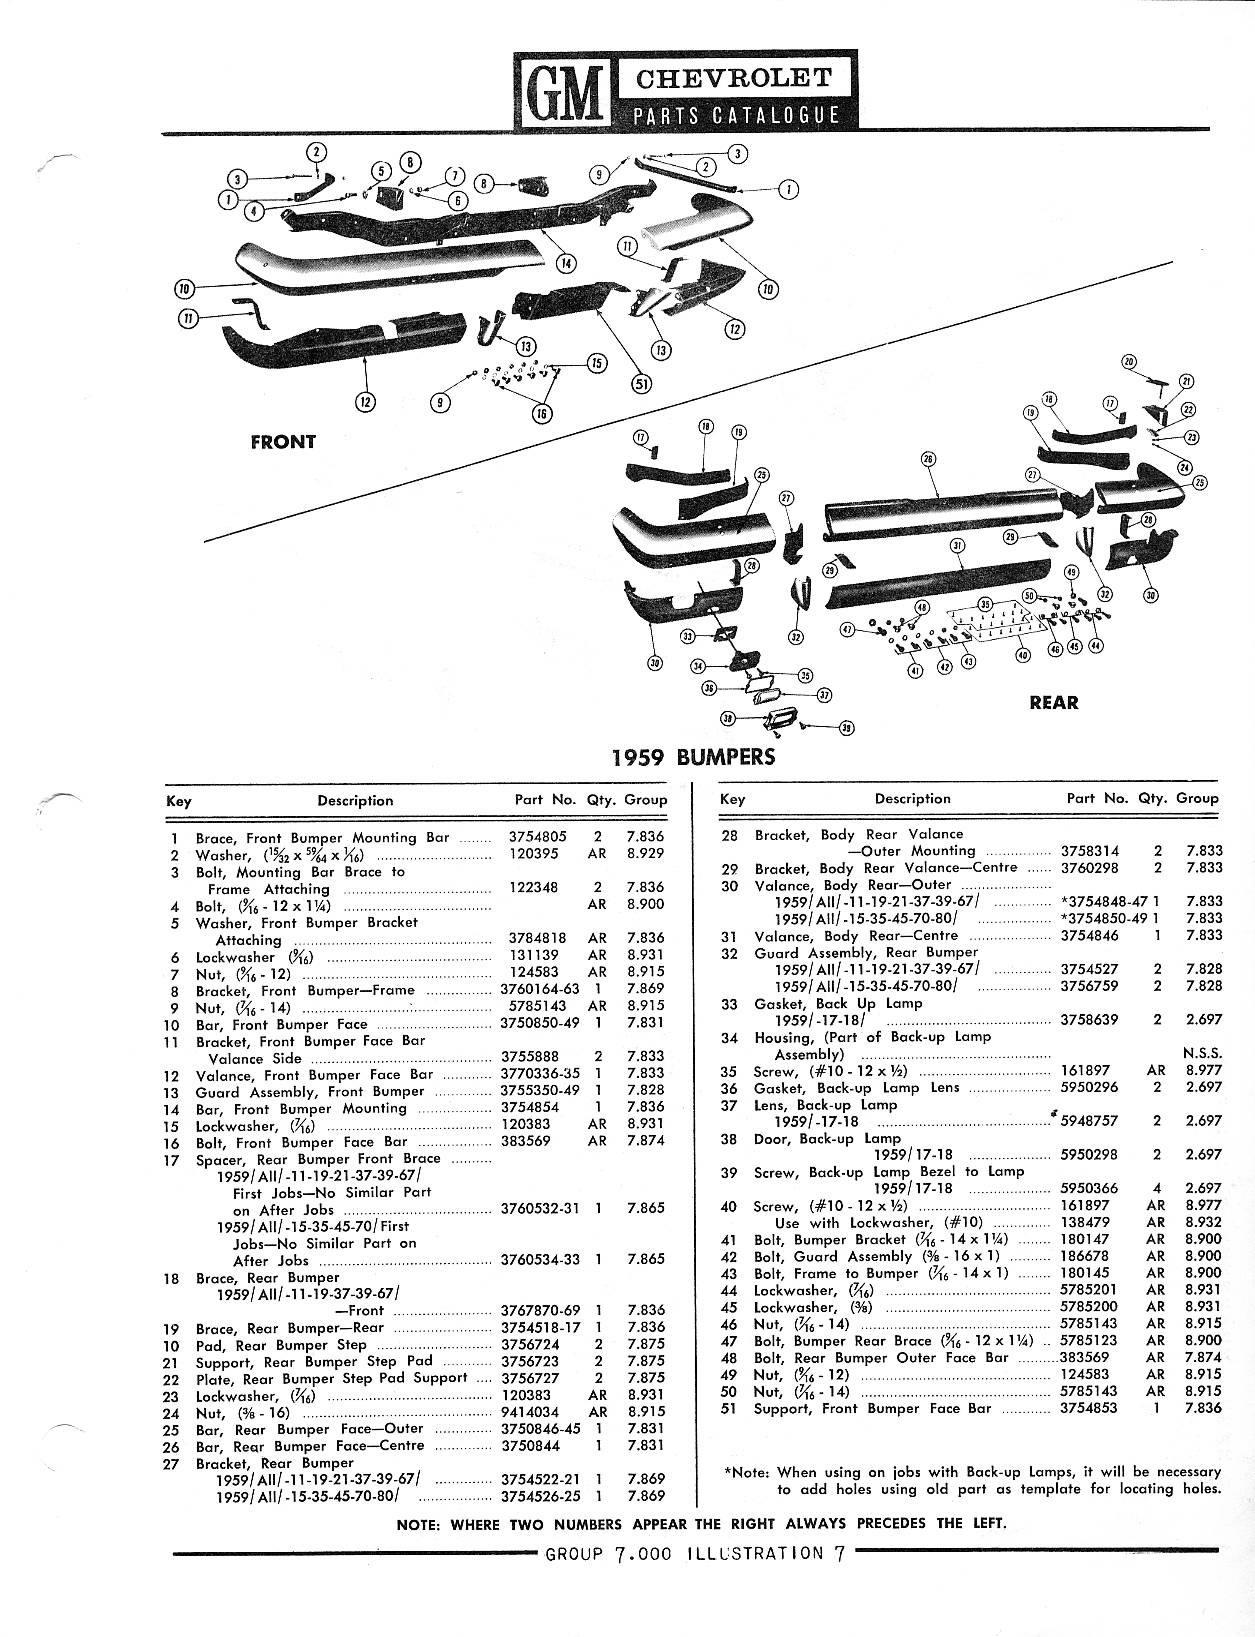 1958-1968 Chevrolet Parts Catalog / Image55.jpg